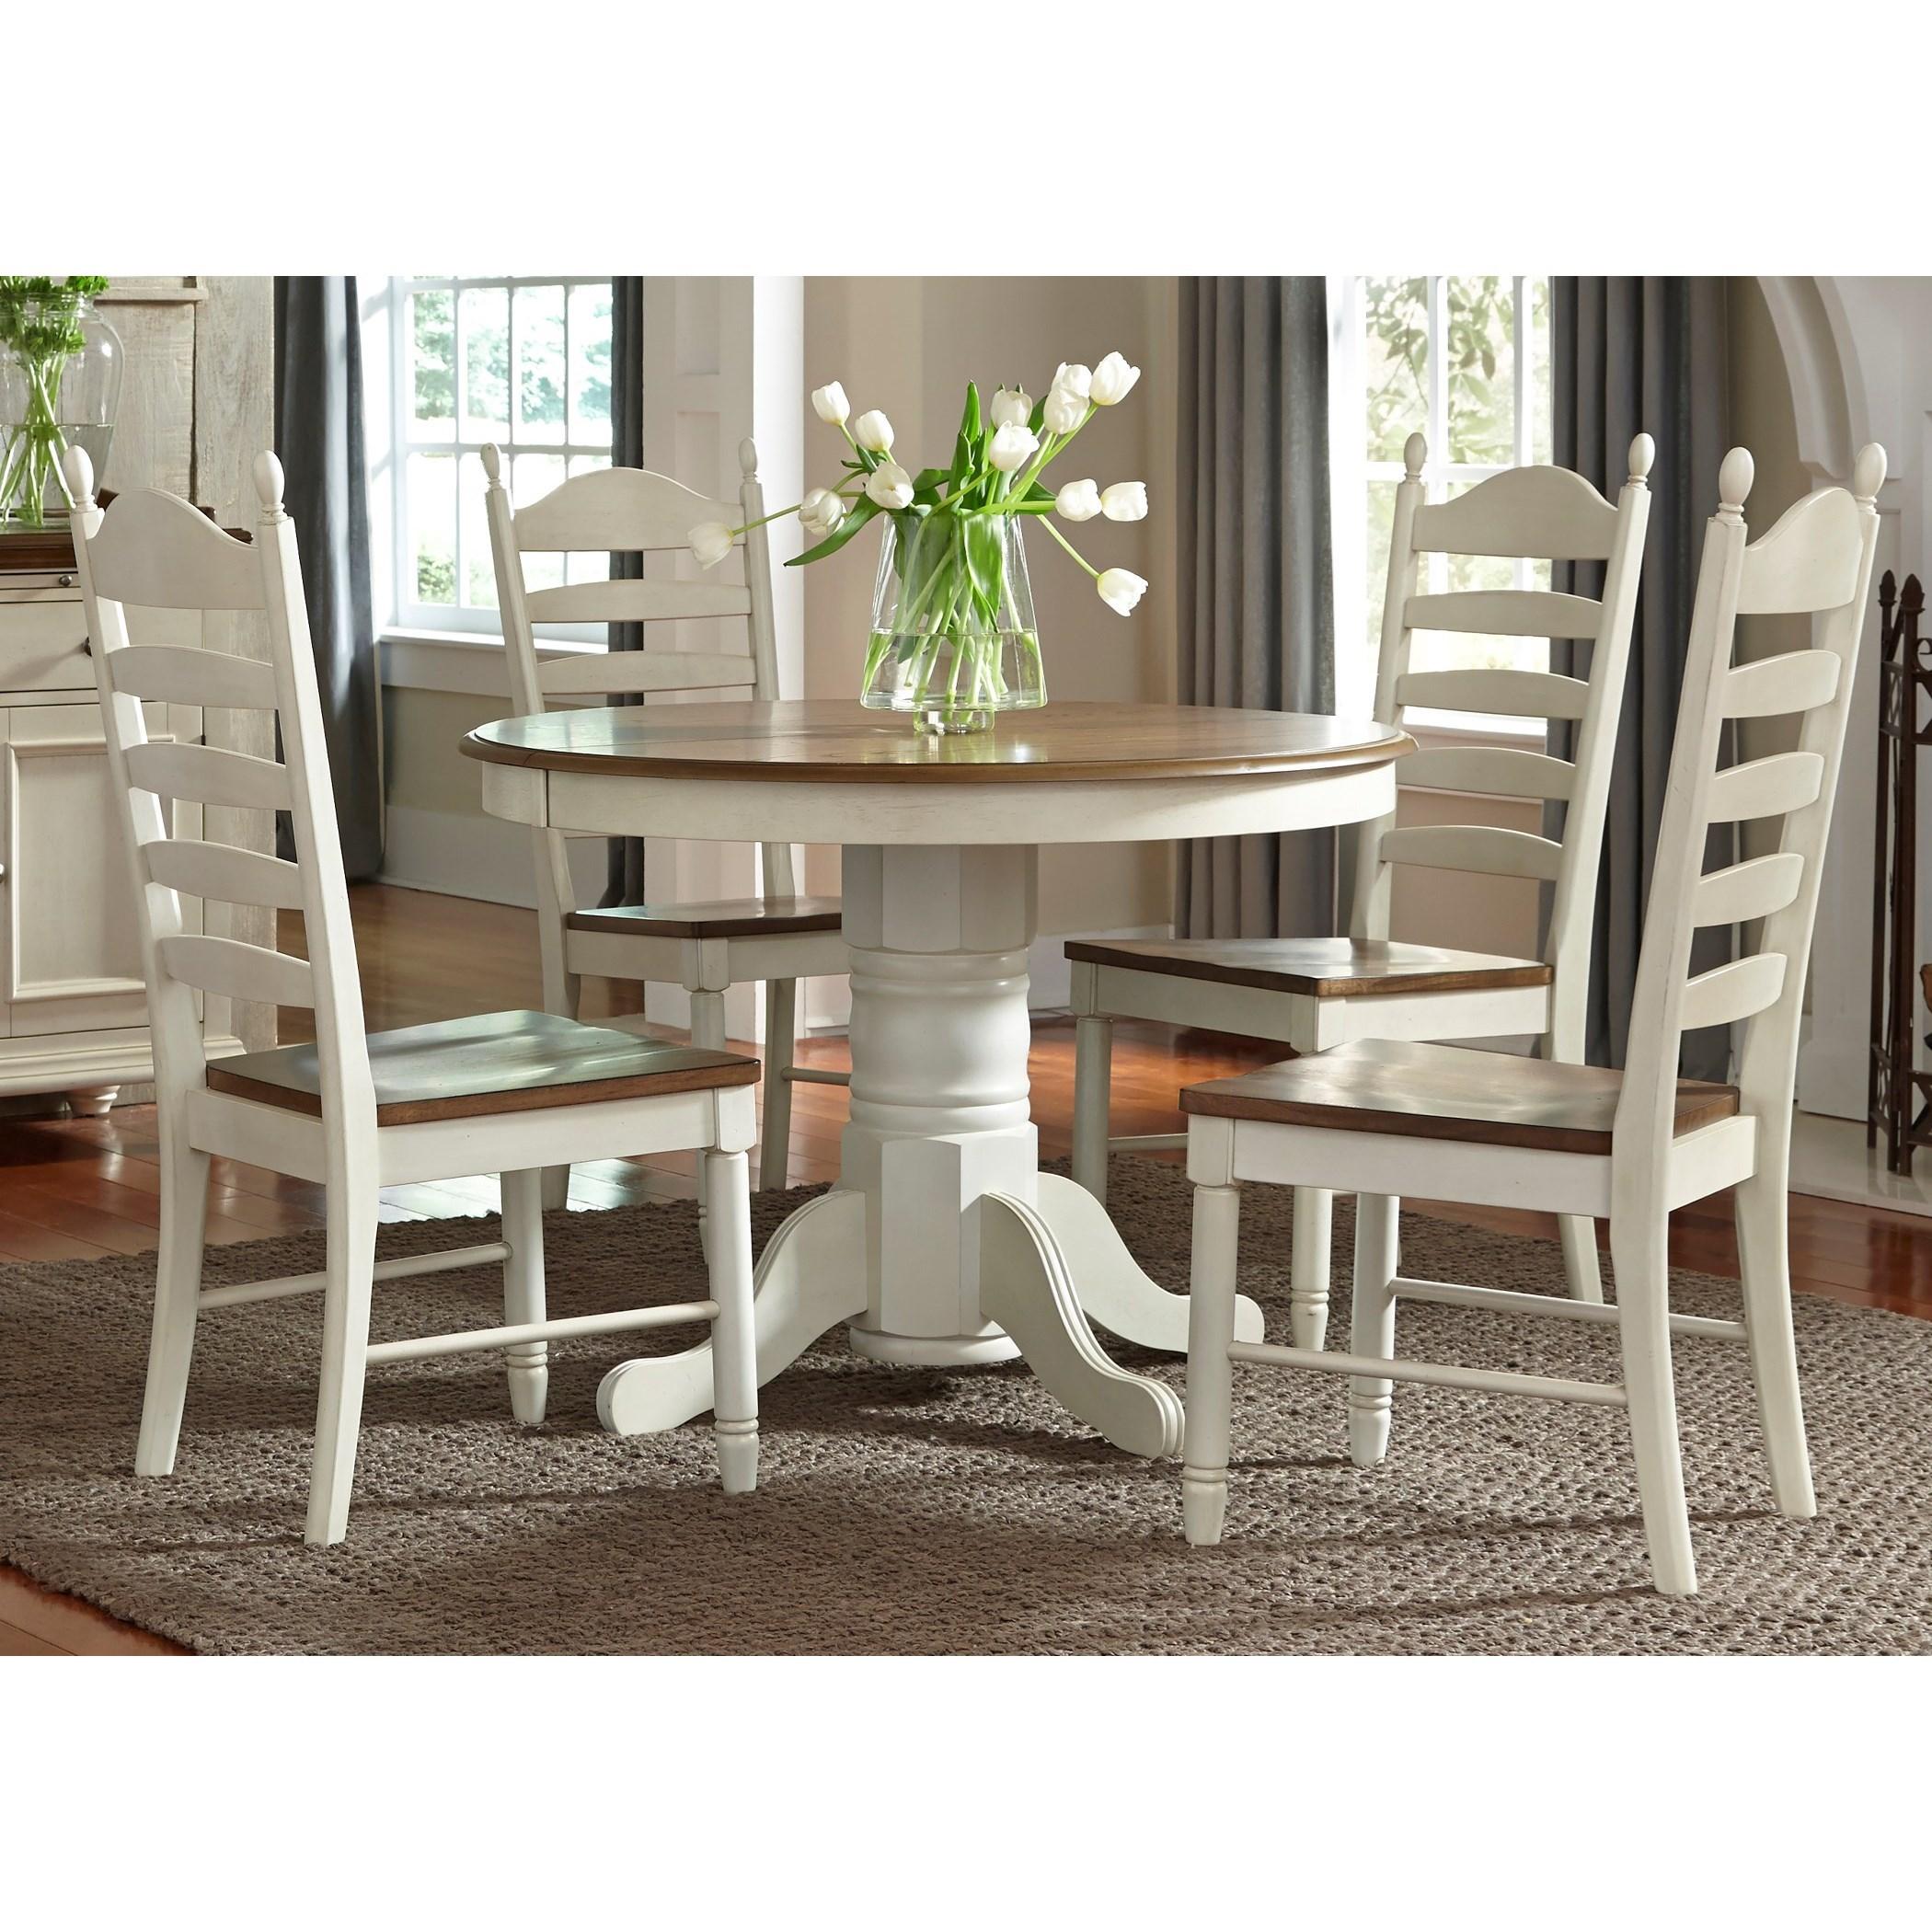 5 Piece Pedestal Table & Chair Set